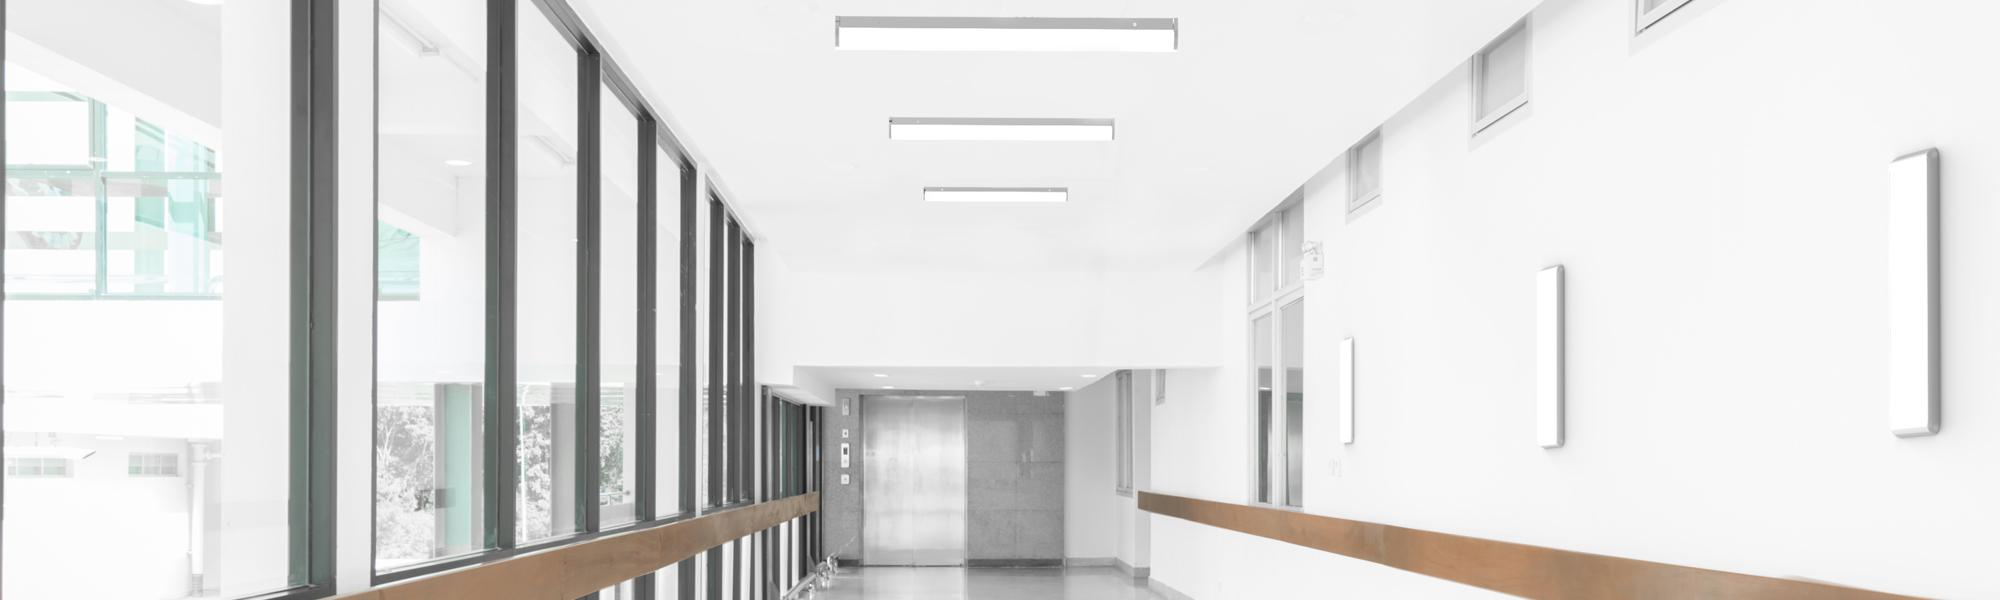 Vigor Tamper Proof LED Lighting Applications